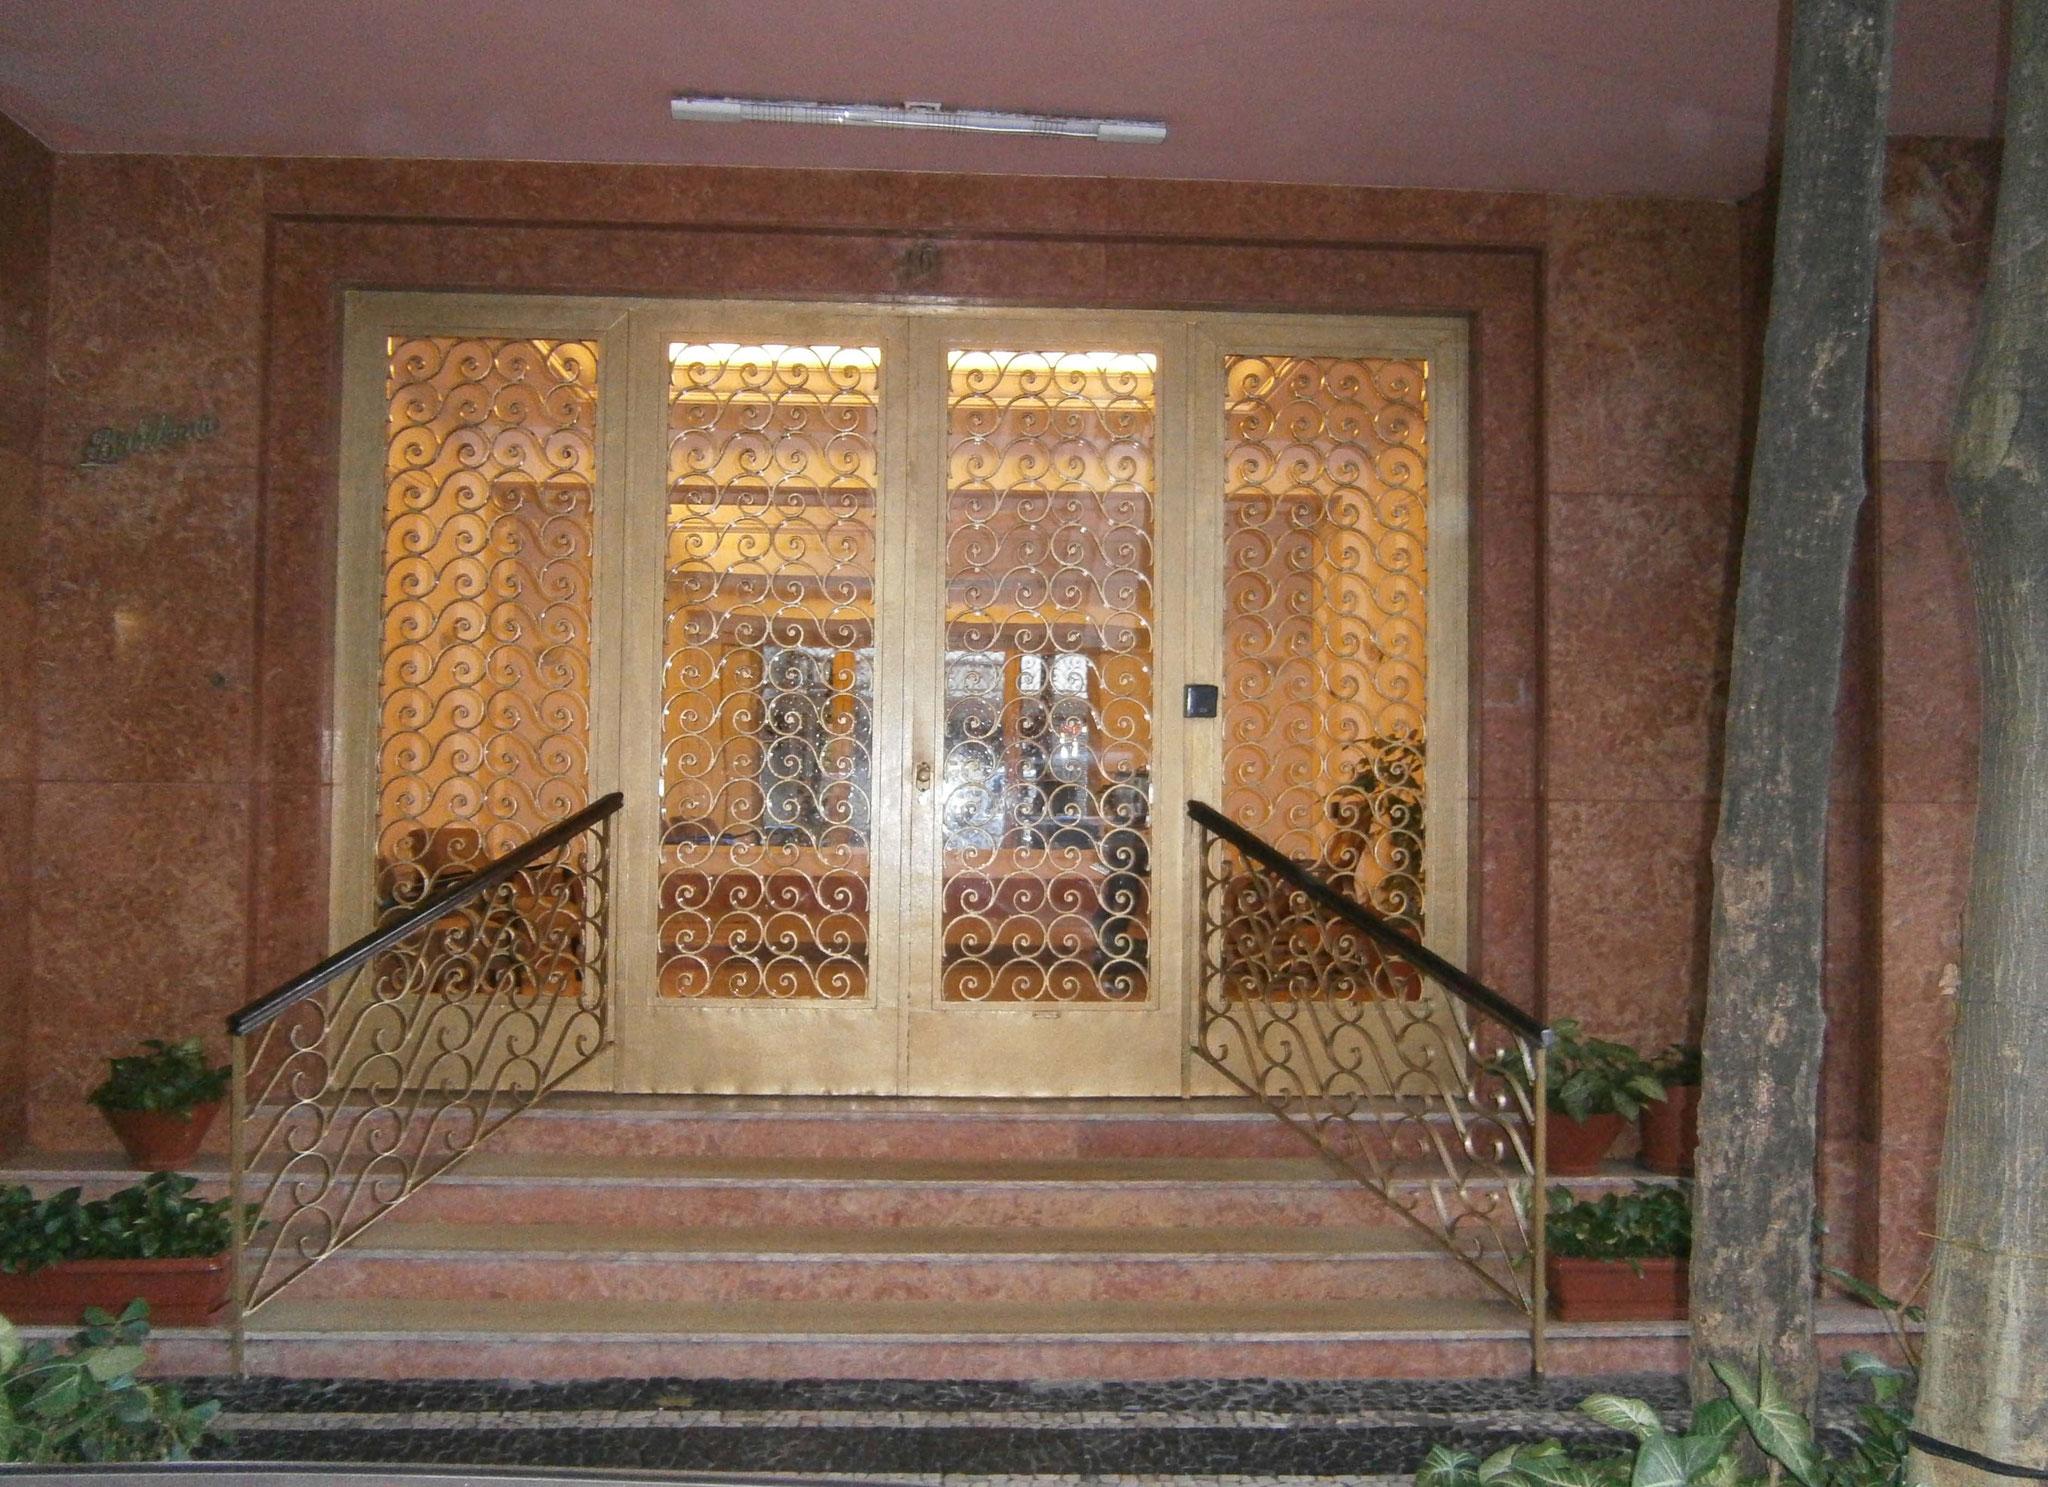 der Gebäudeeingang